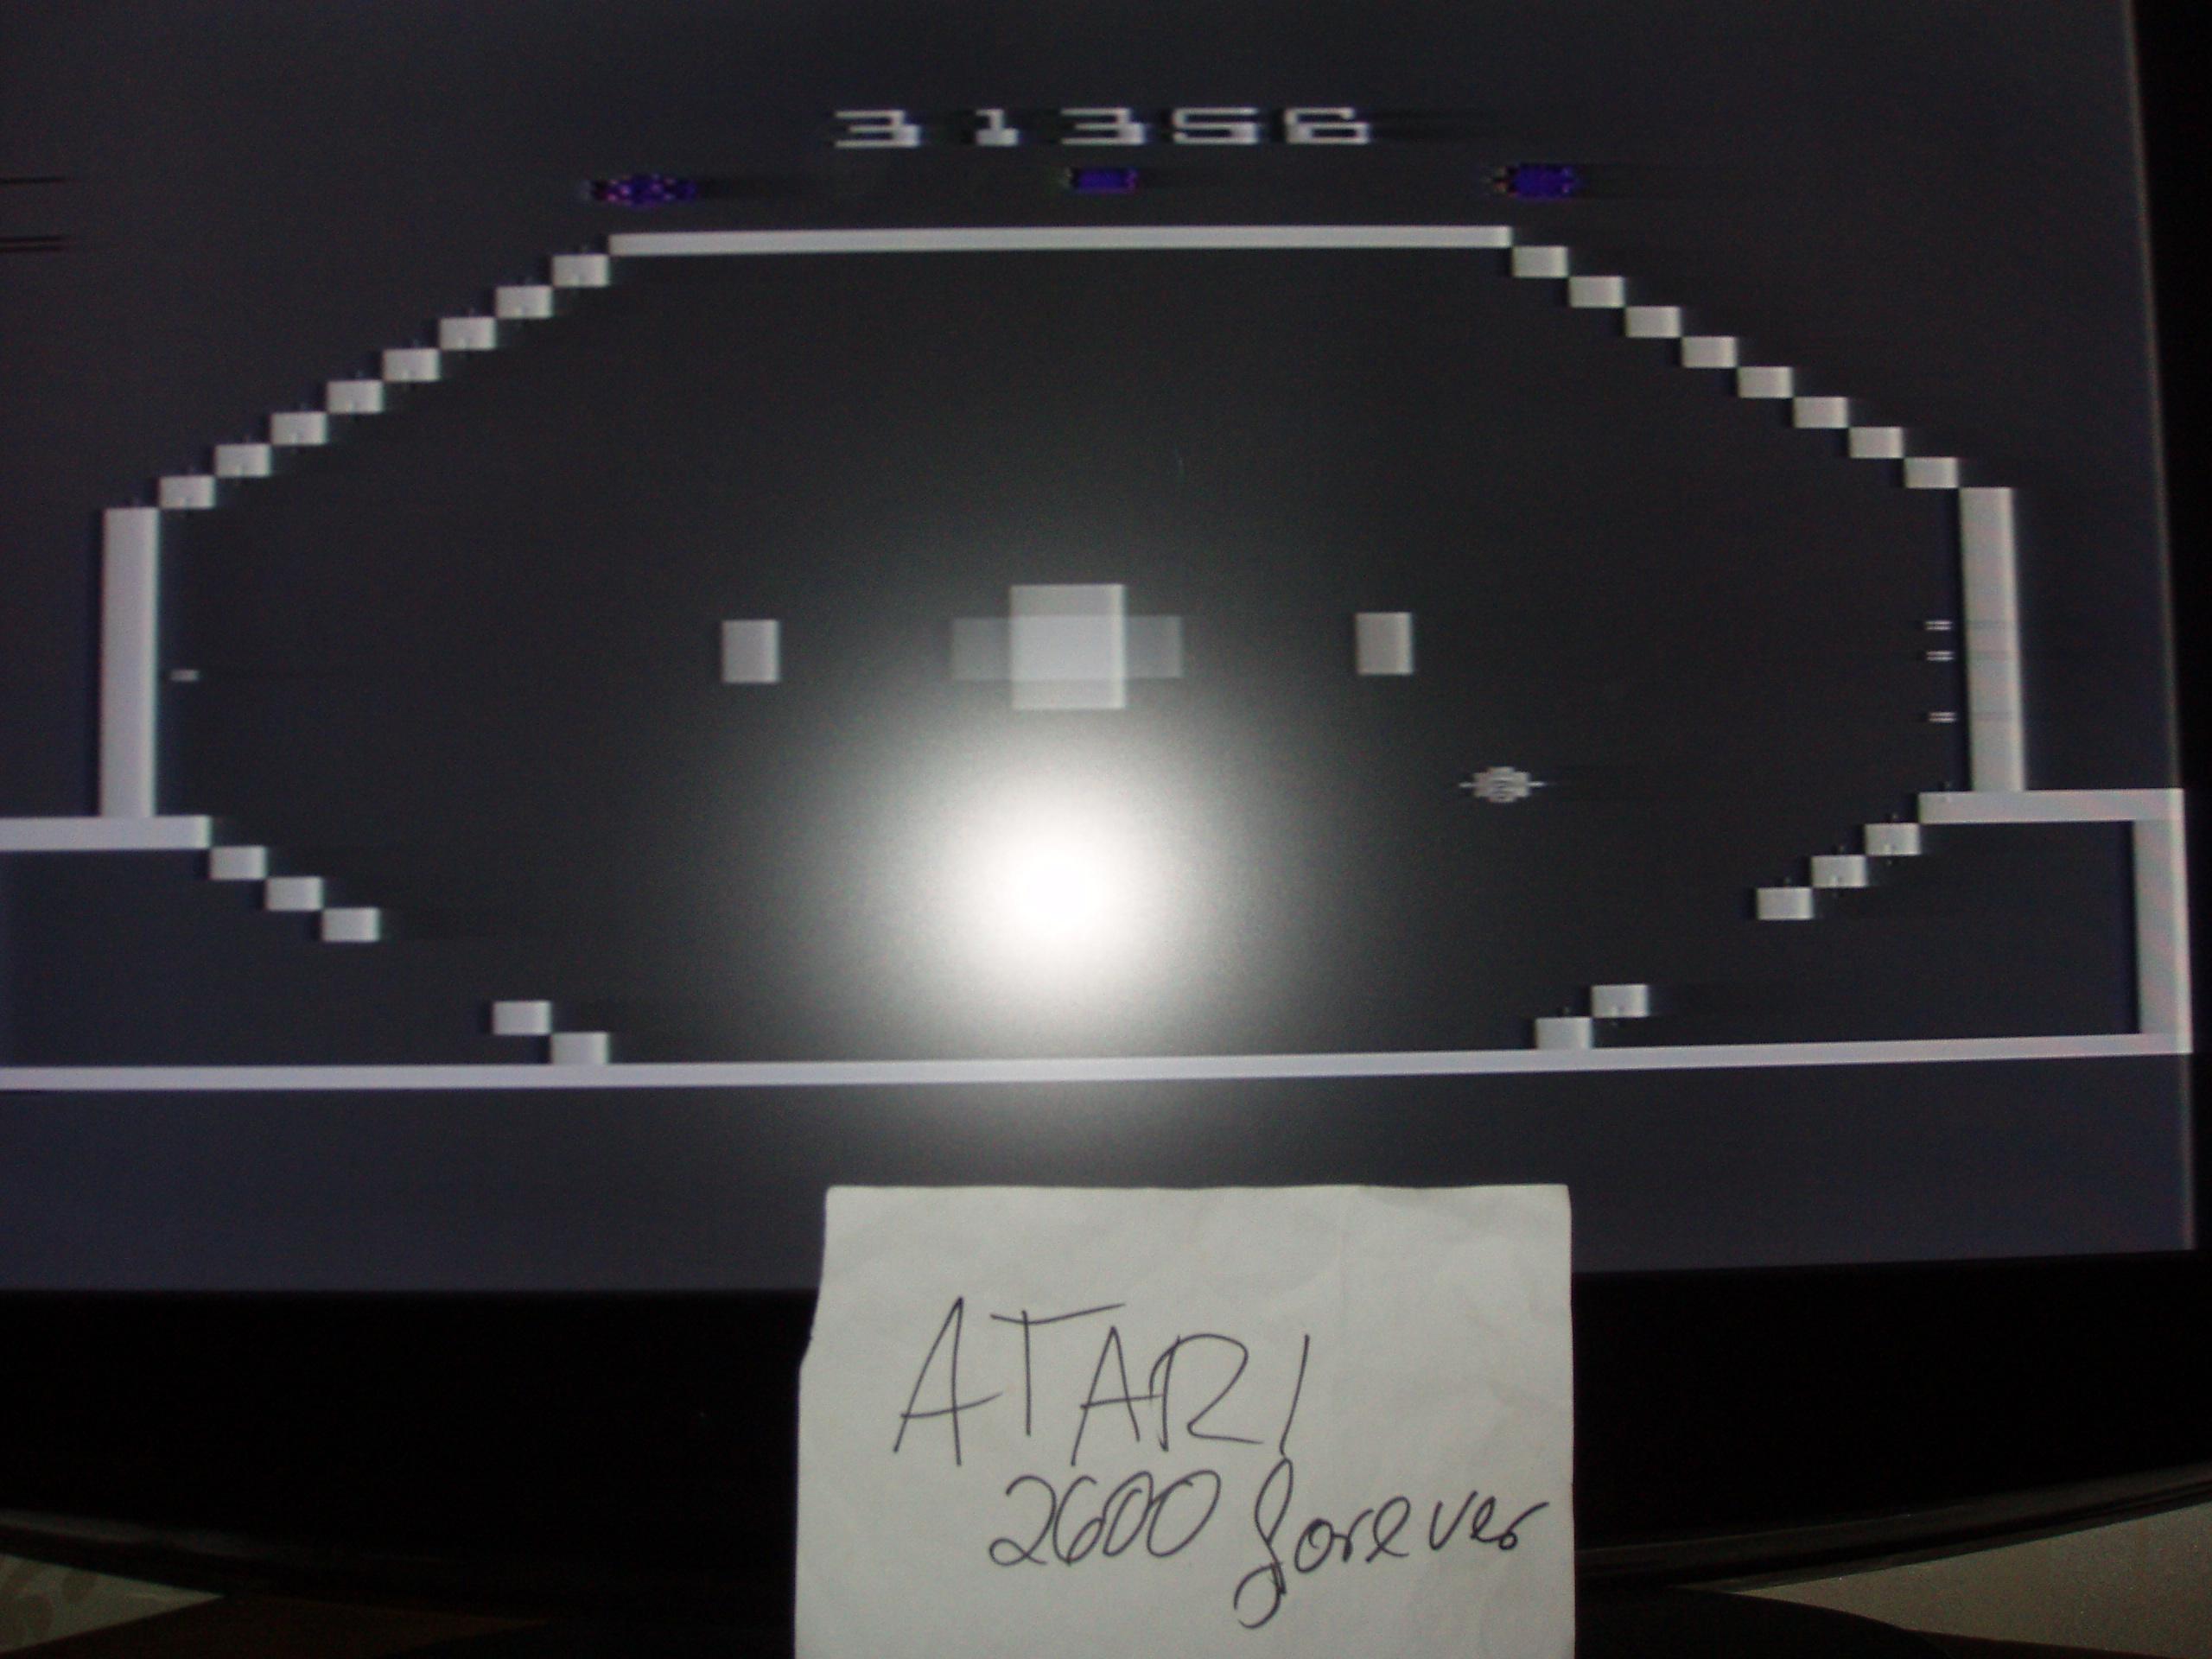 atari2600forever: Reactor (Atari 2600 Novice/B) 31,356 points on 2019-03-15 06:56:46